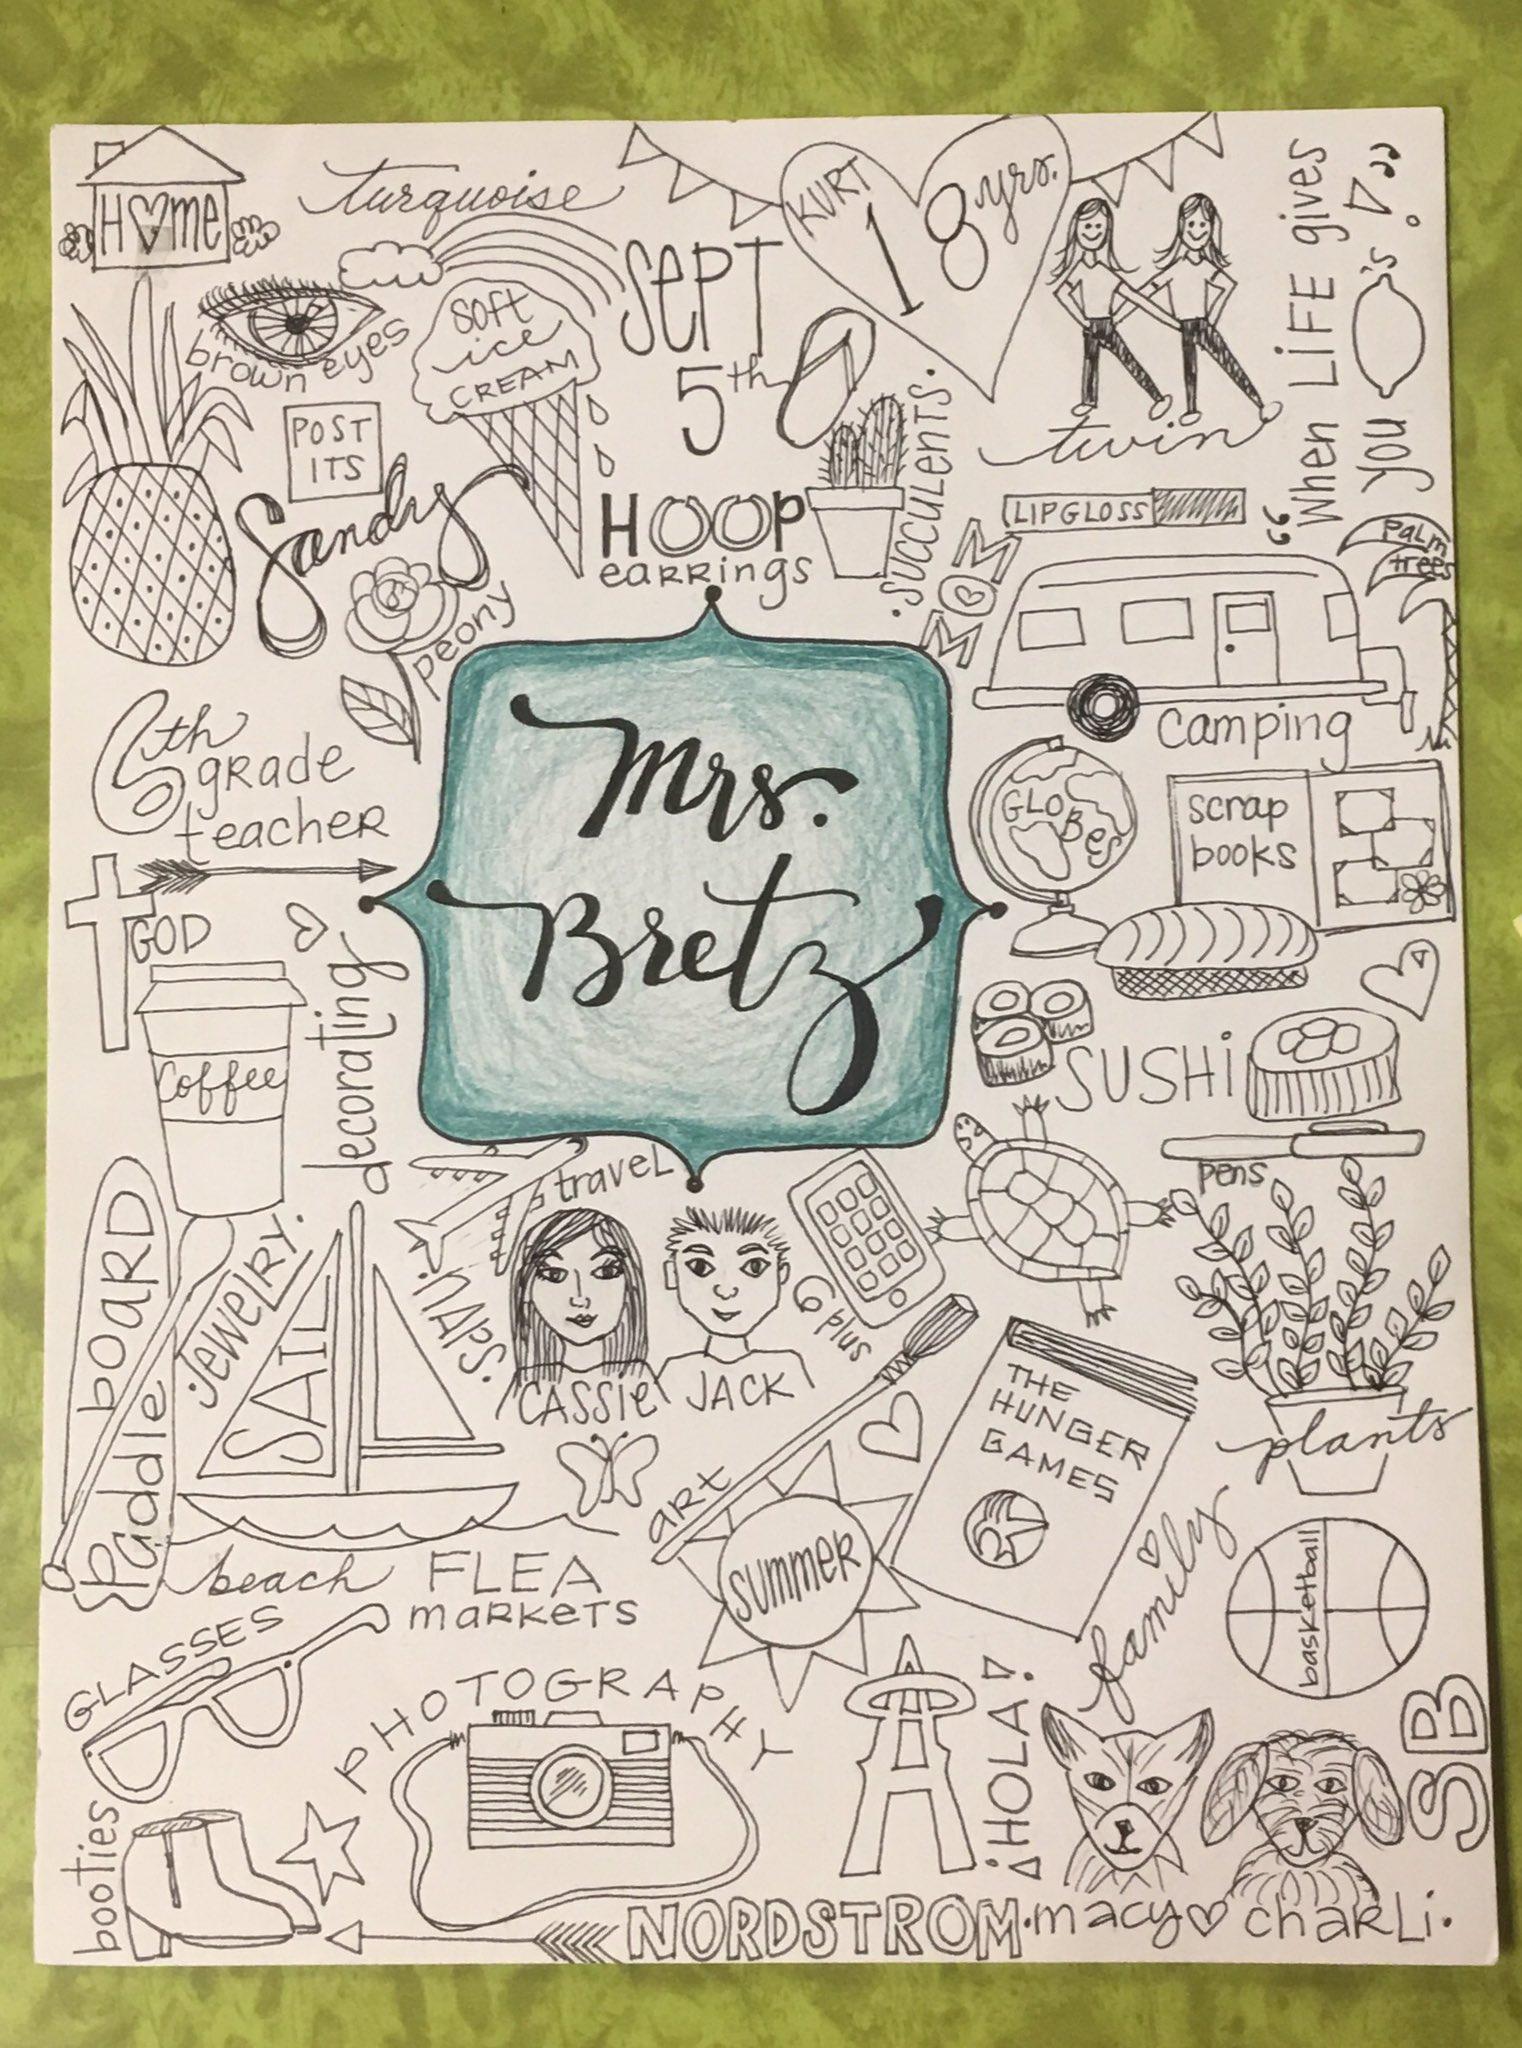 #sketch50 Day 9: Interests and Hobbies @sketch_50 @blairslug @cindyyuribak @annkozma723 @teachusingtech @sylviaduckworth @Jyoung1219 https://t.co/3eVgxDTkTi